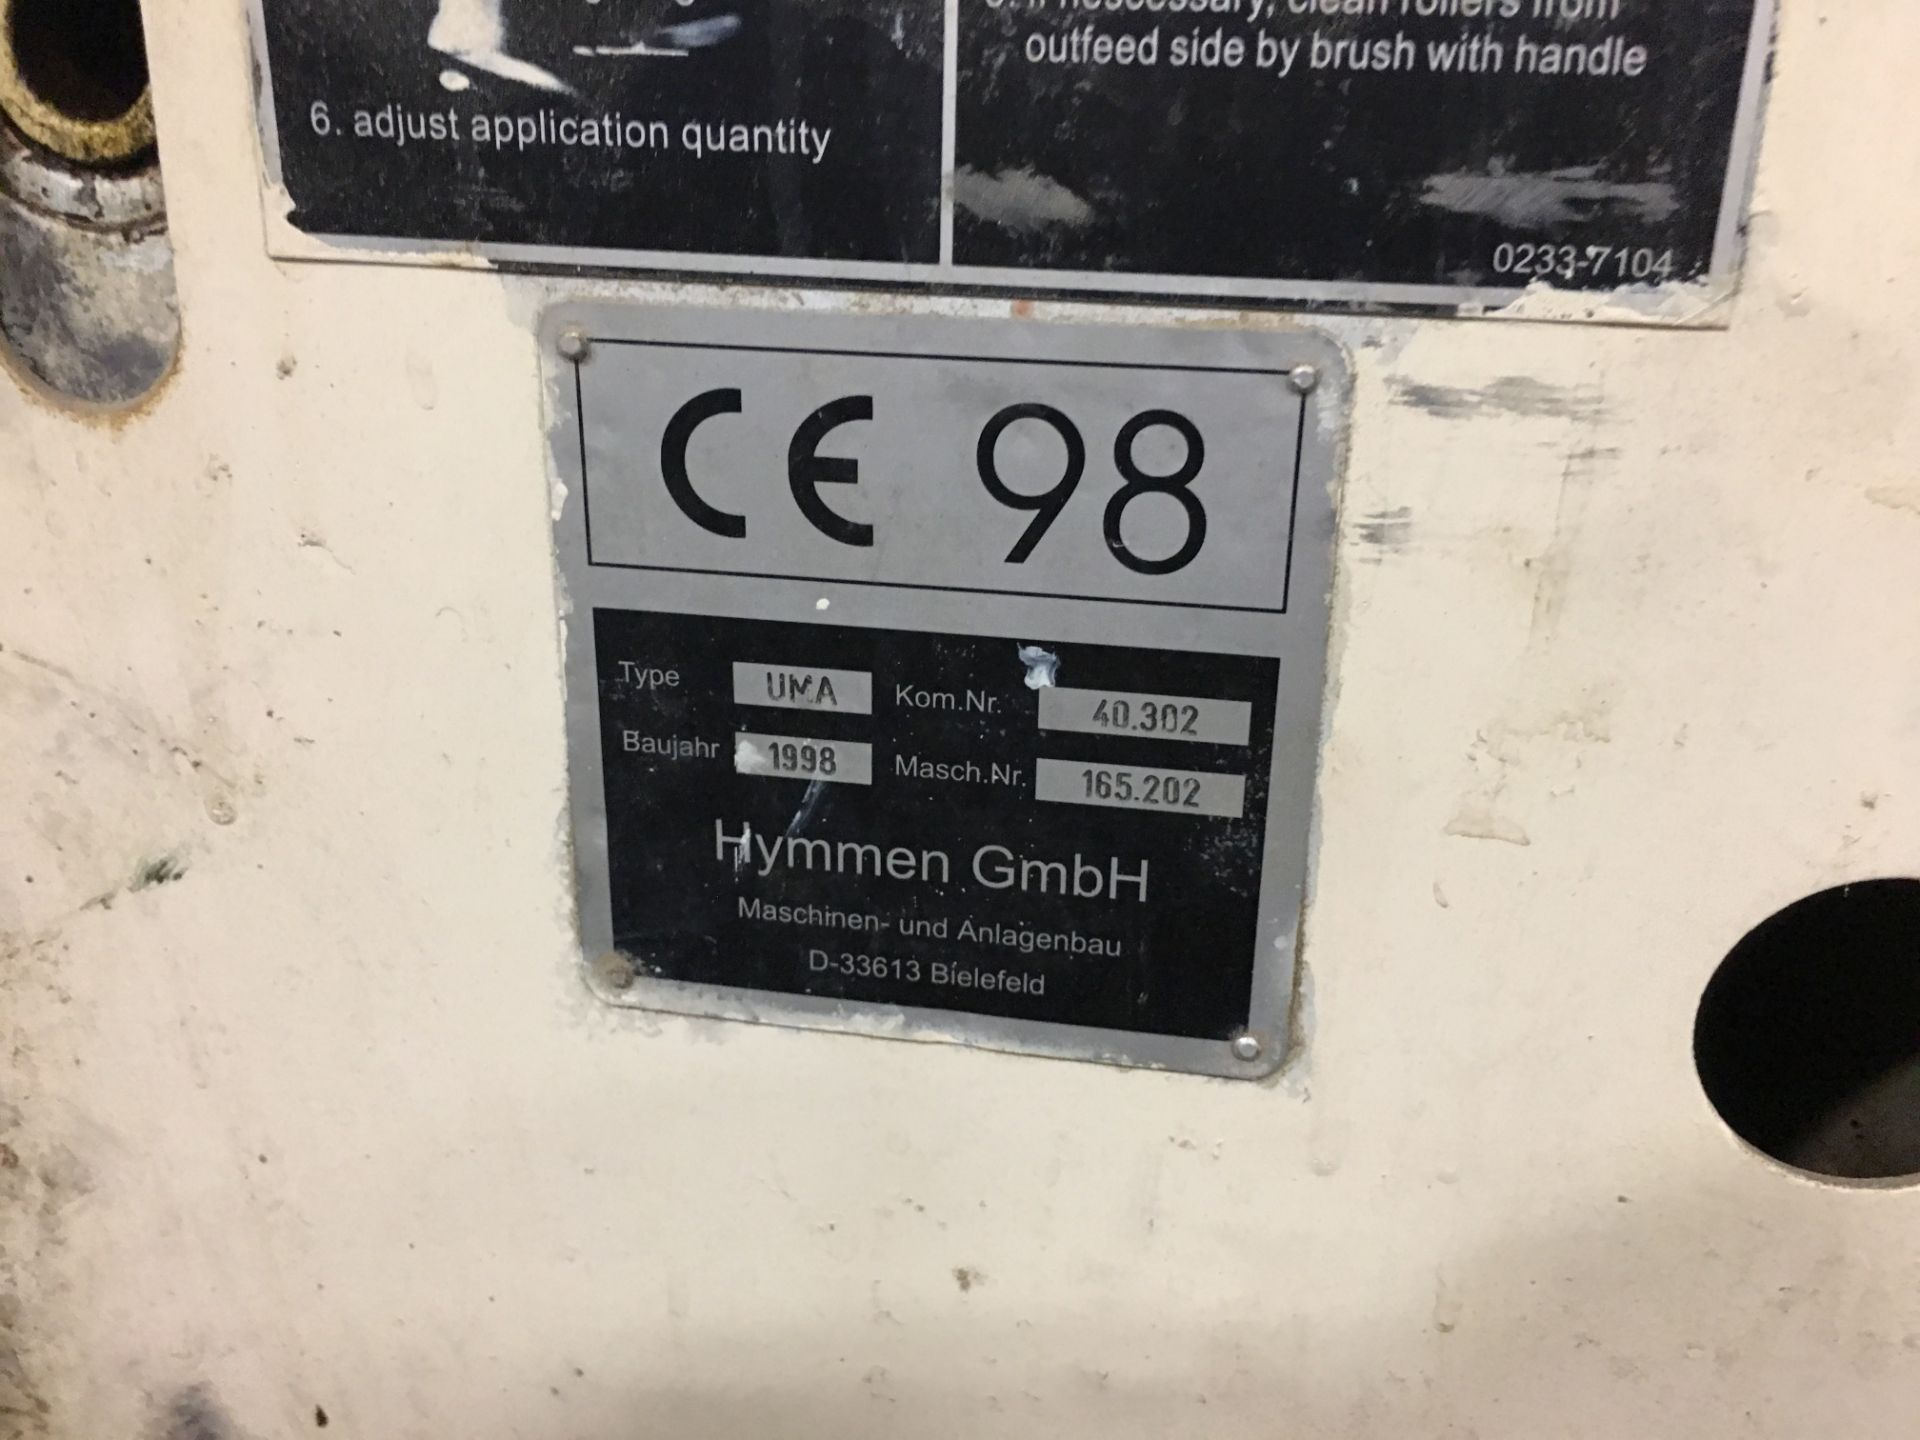 HYMMEN (UMA) GLUE SPREADER - Image 2 of 3